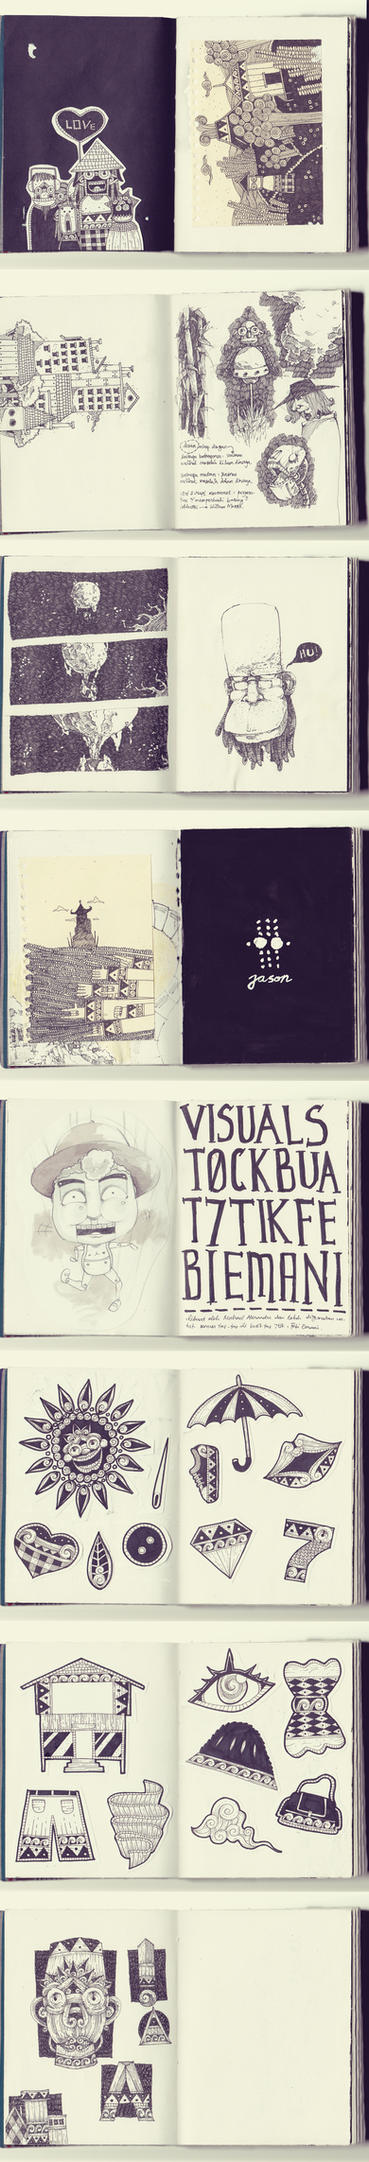 sketchbook drawings by BountyList